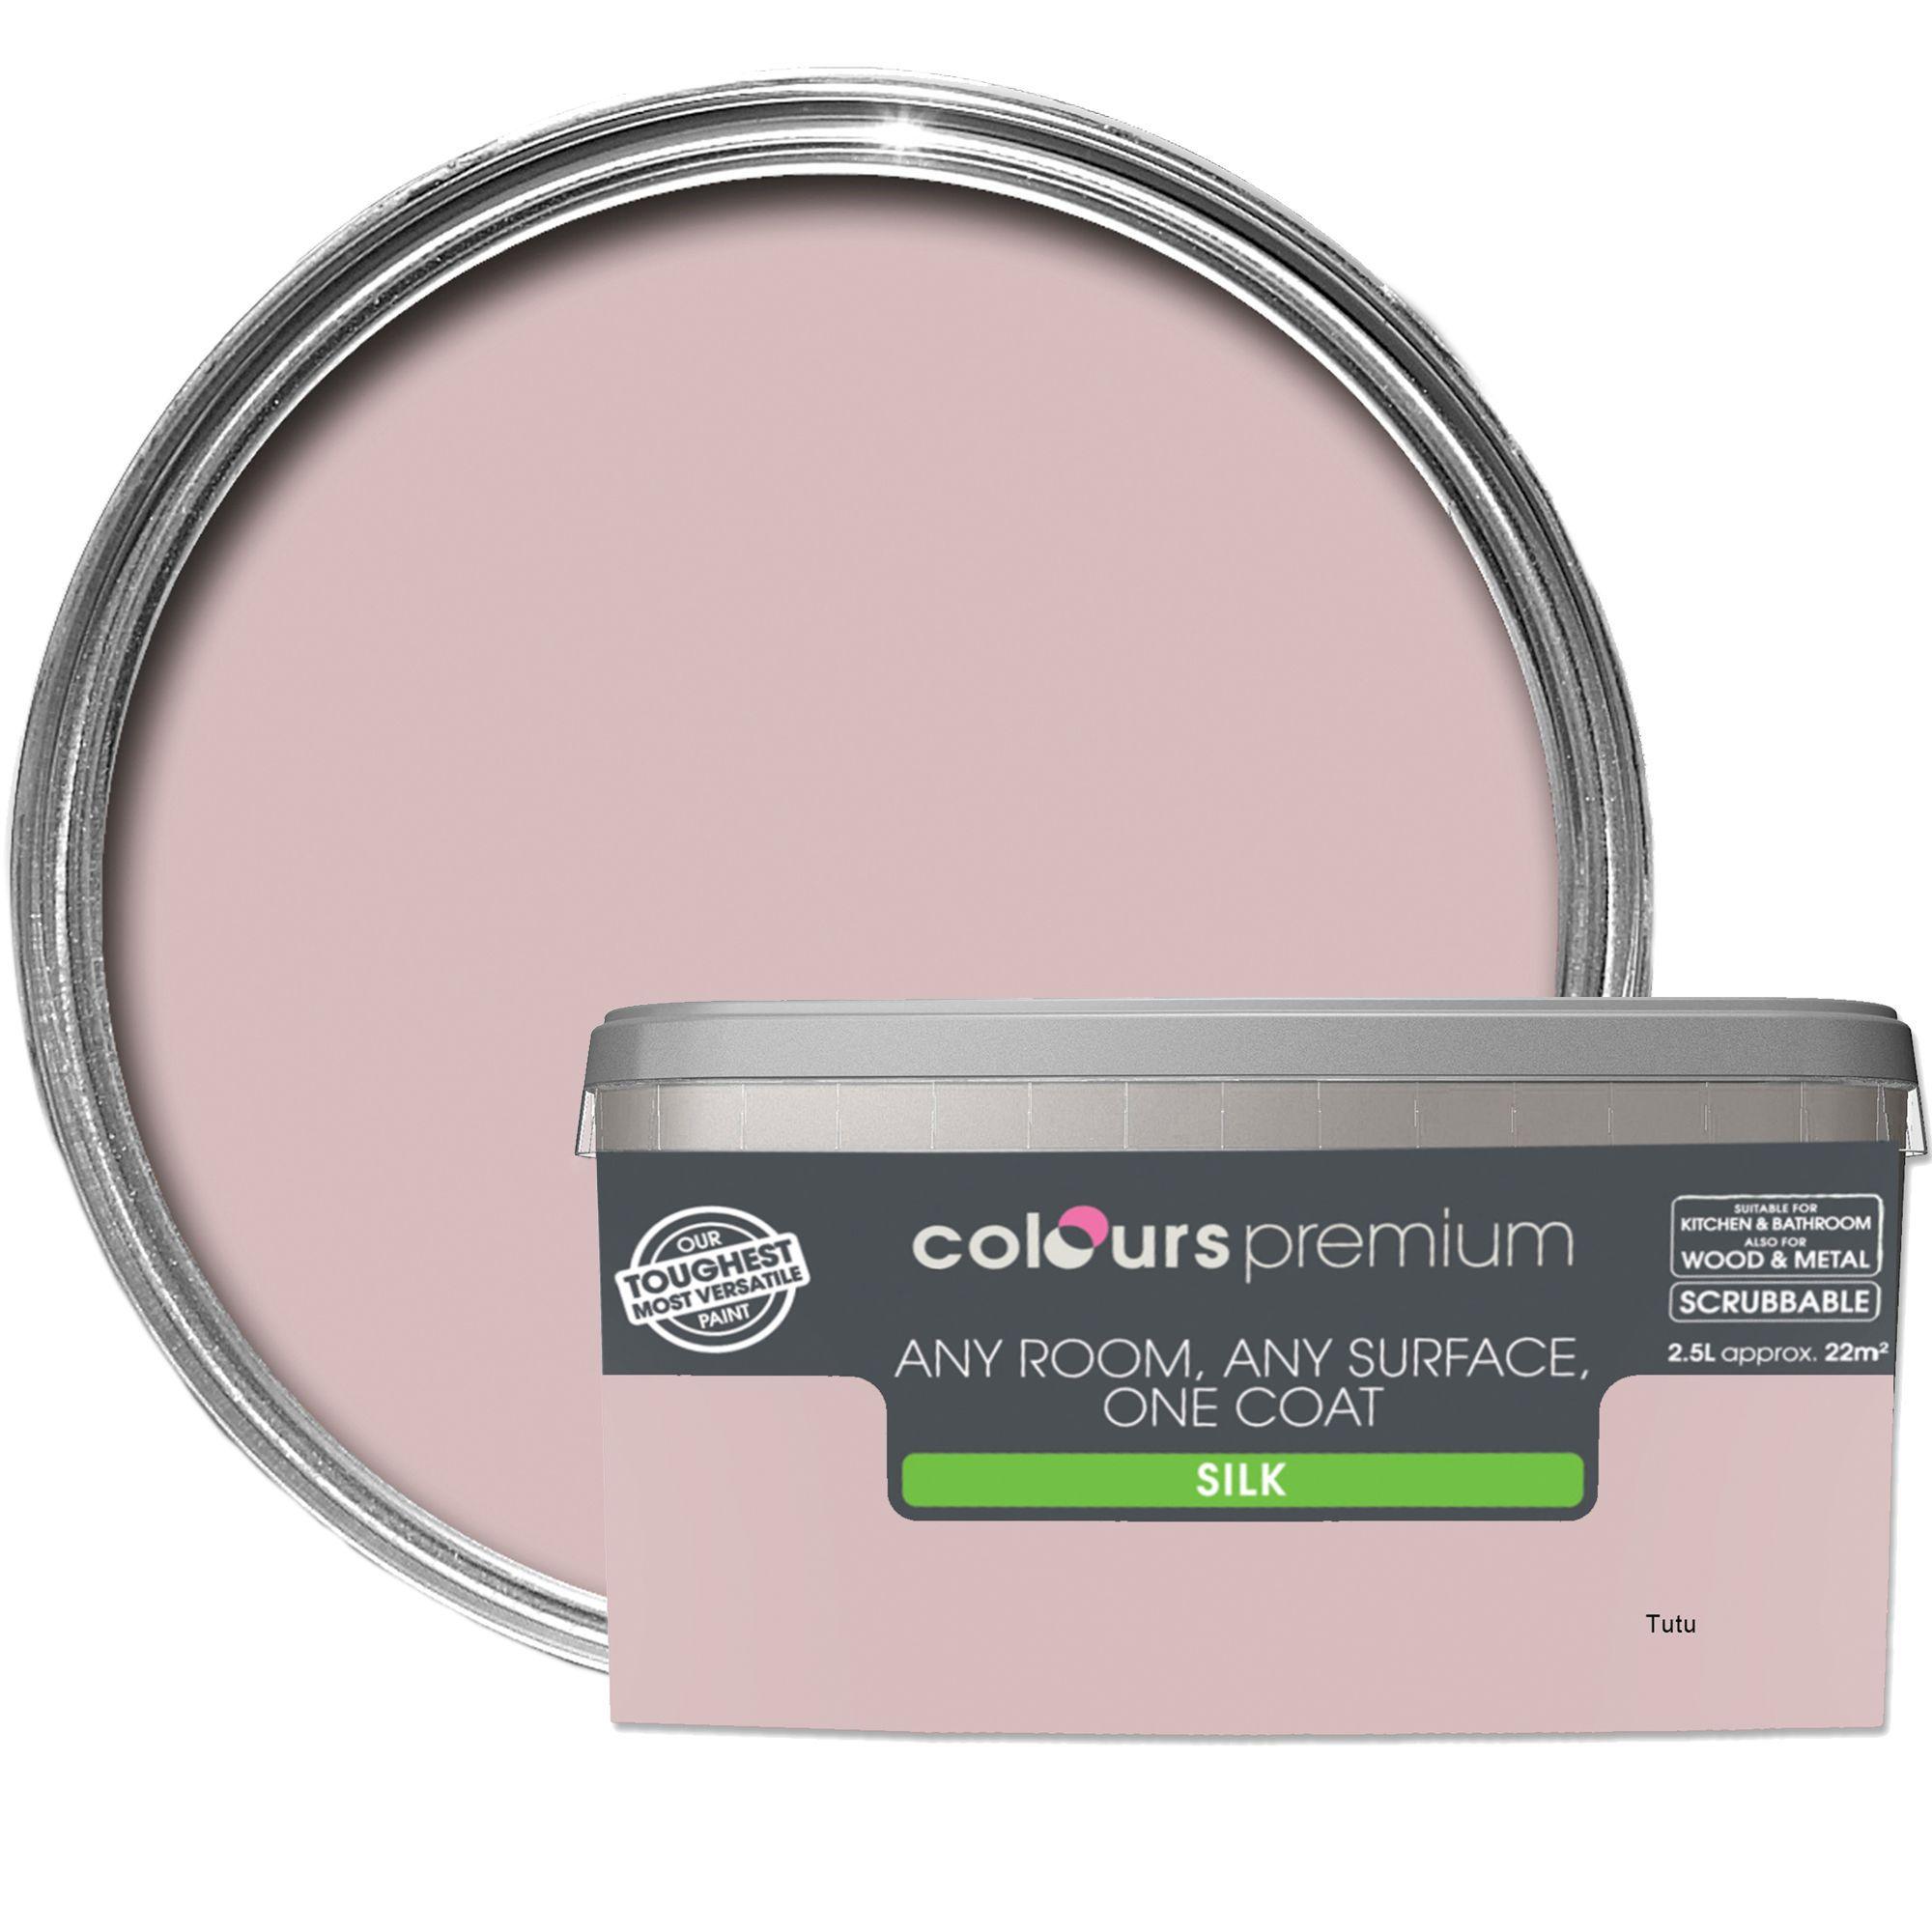 Surprising Colours Premium Tutu Silk Emulsion Paint 2 5L Departments Diy At Bq Interior Design Ideas Apansoteloinfo